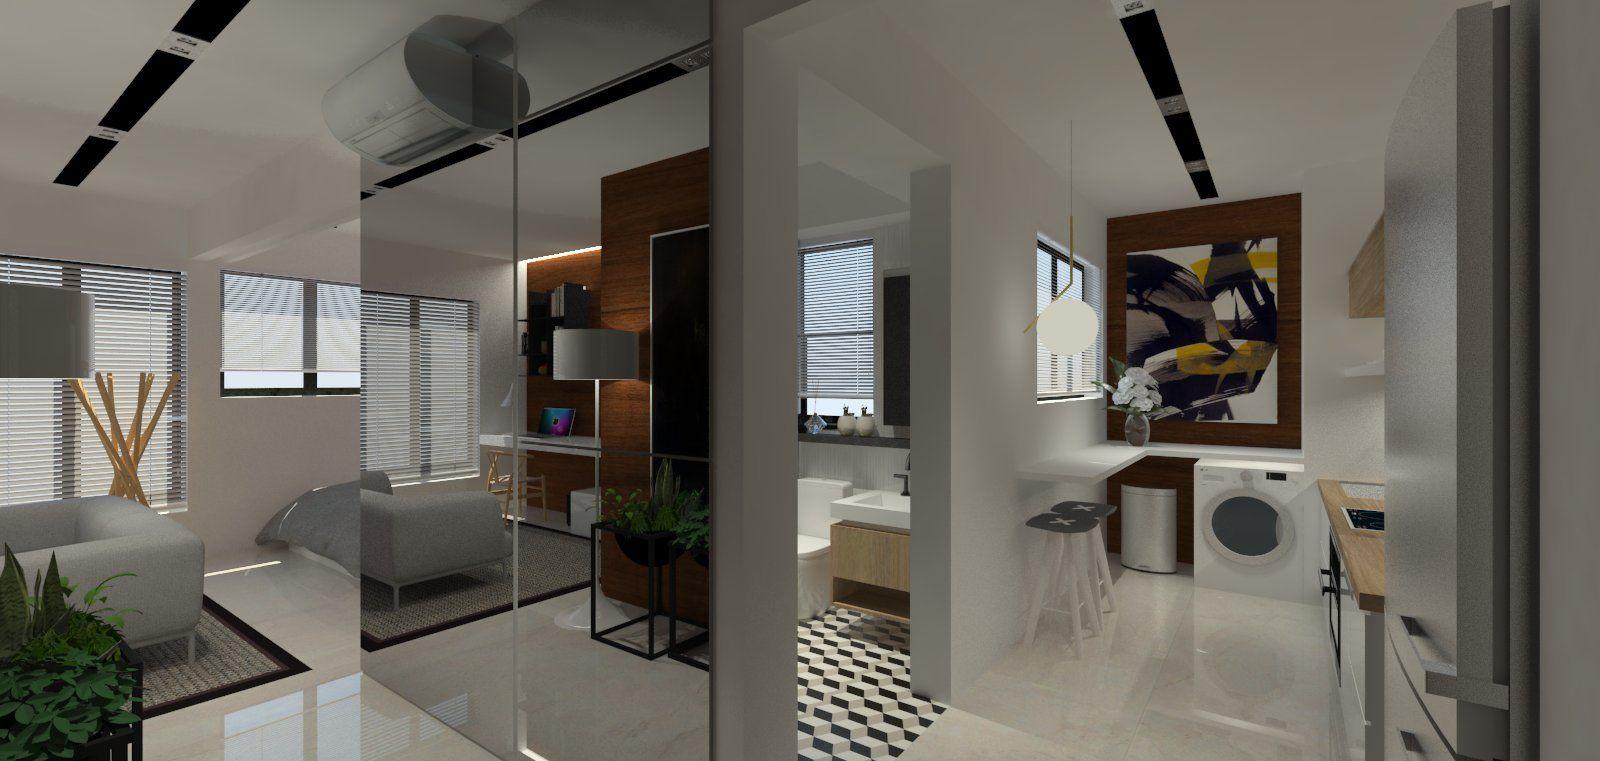 style hdb 2 room bto for singles 47sqm apartment interior